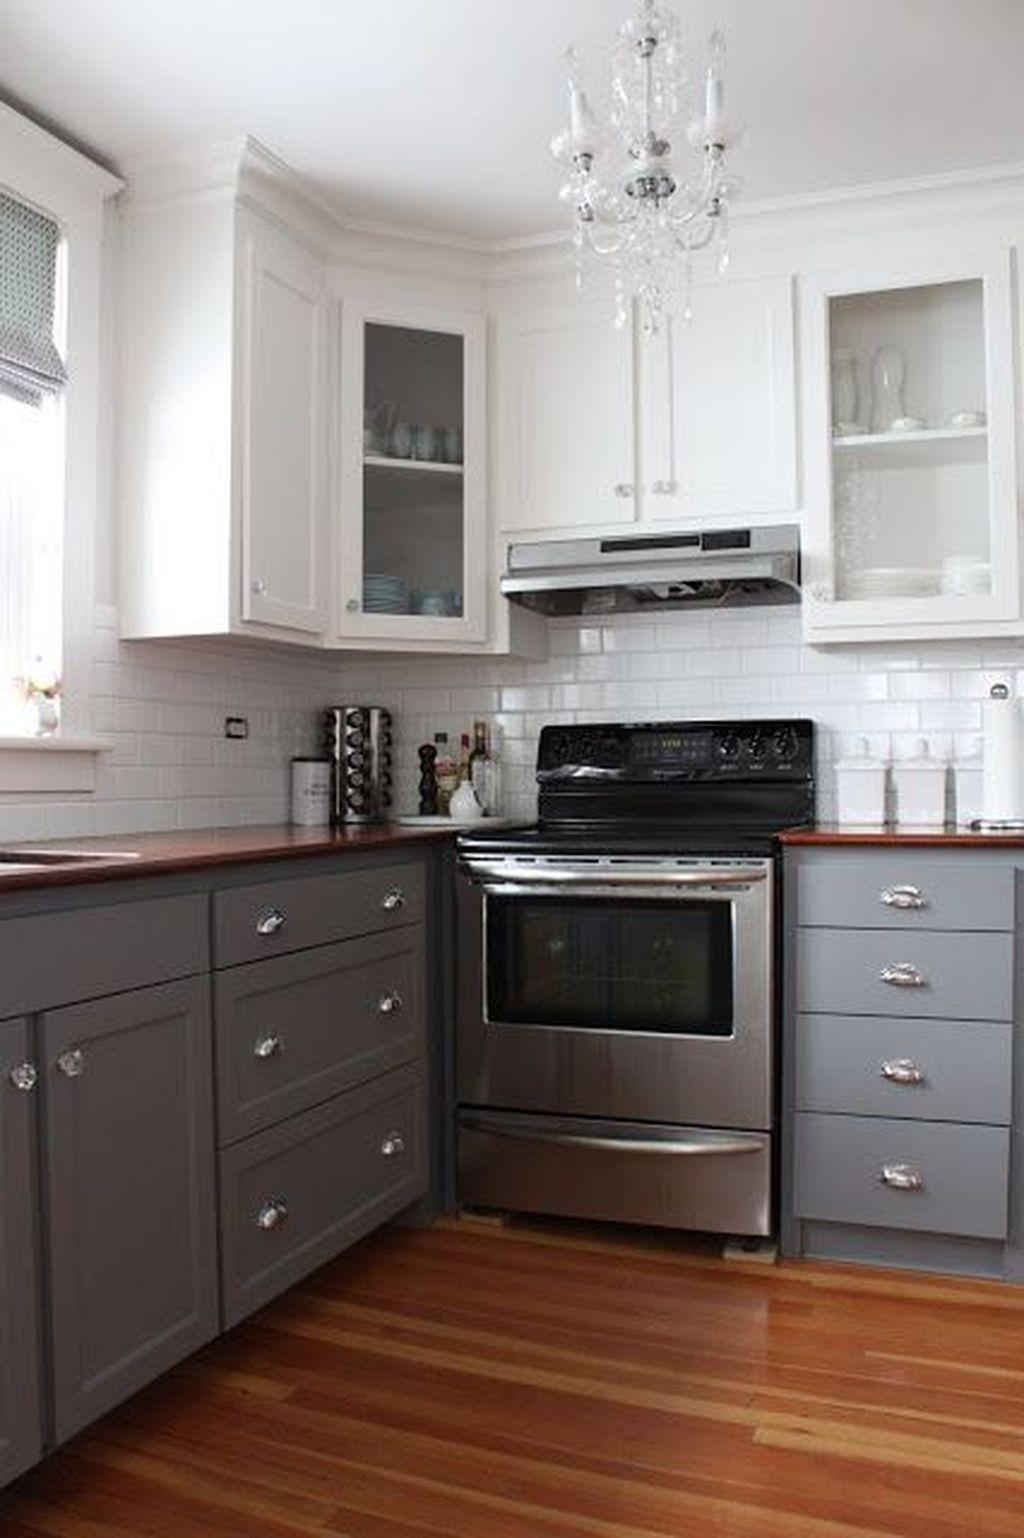 Awesome 42 The Best Modern Kitchen Cabinets Ideas Perfect For Any Kitchen Design Kitchen Cabinets Decor Kitchen Design Home Kitchens